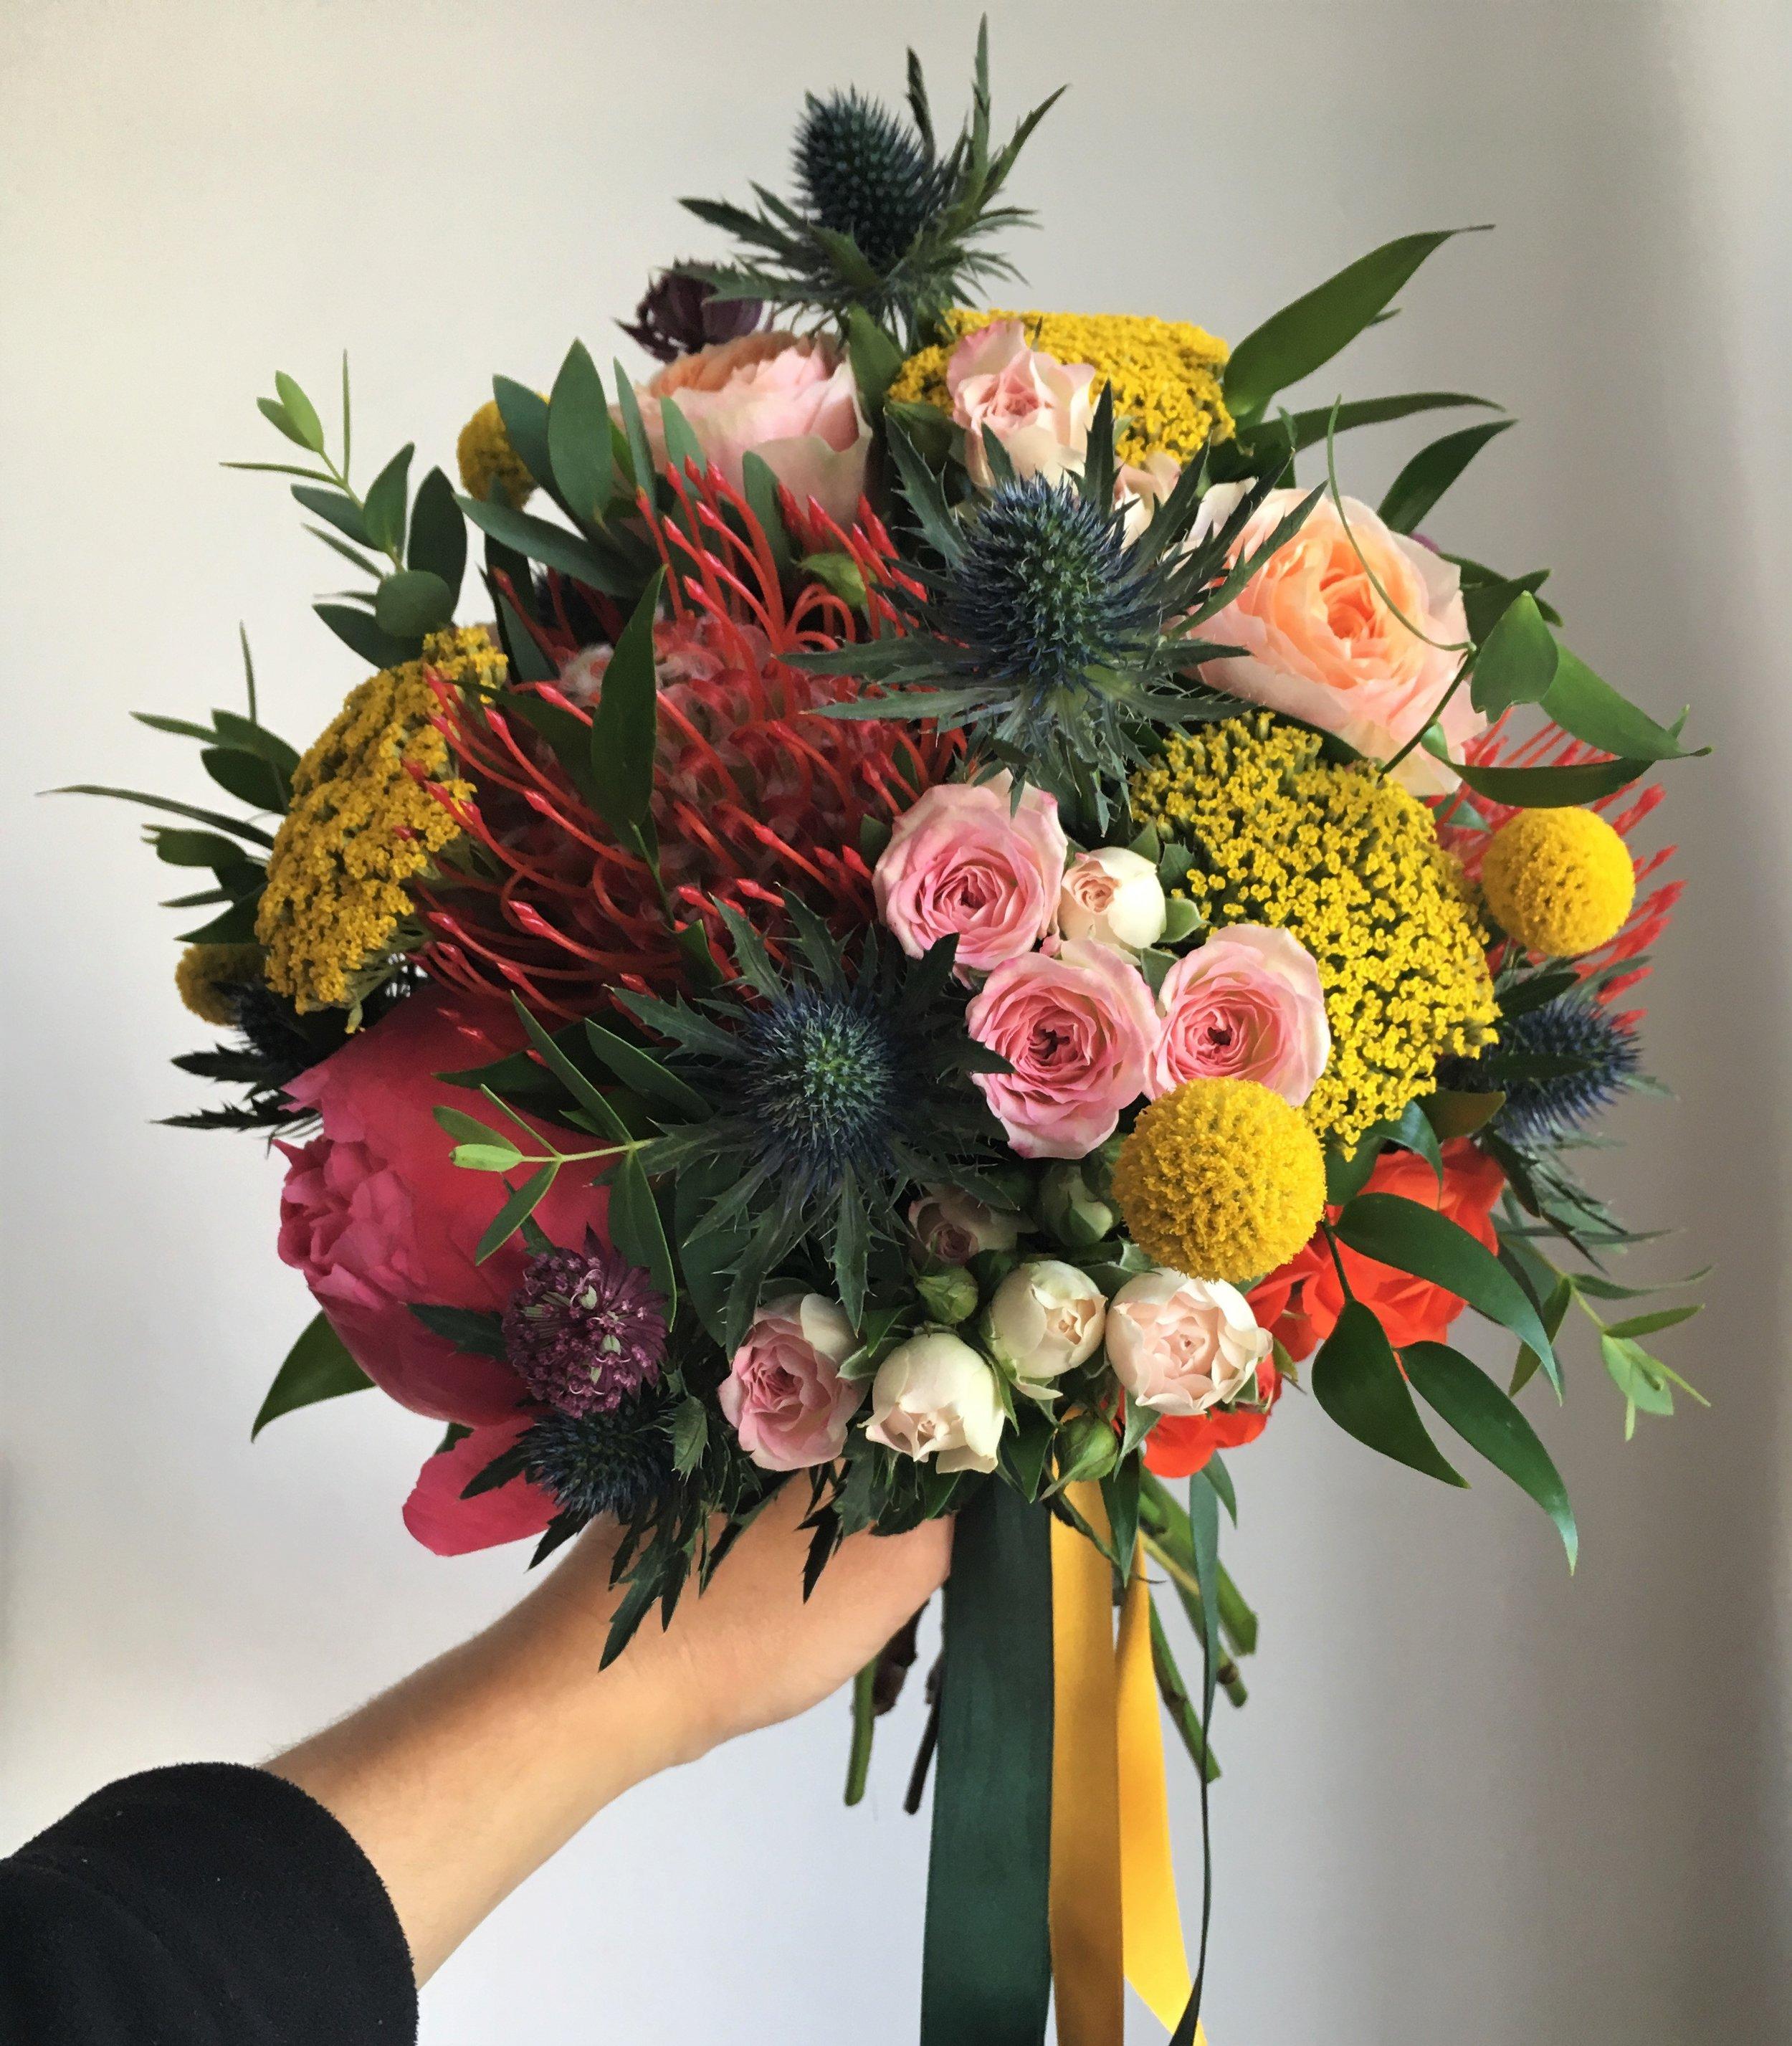 Wedding-Flowers-Brighton-Sussex-Florist-Bridal-Webb-and-Farrer (6).JPG